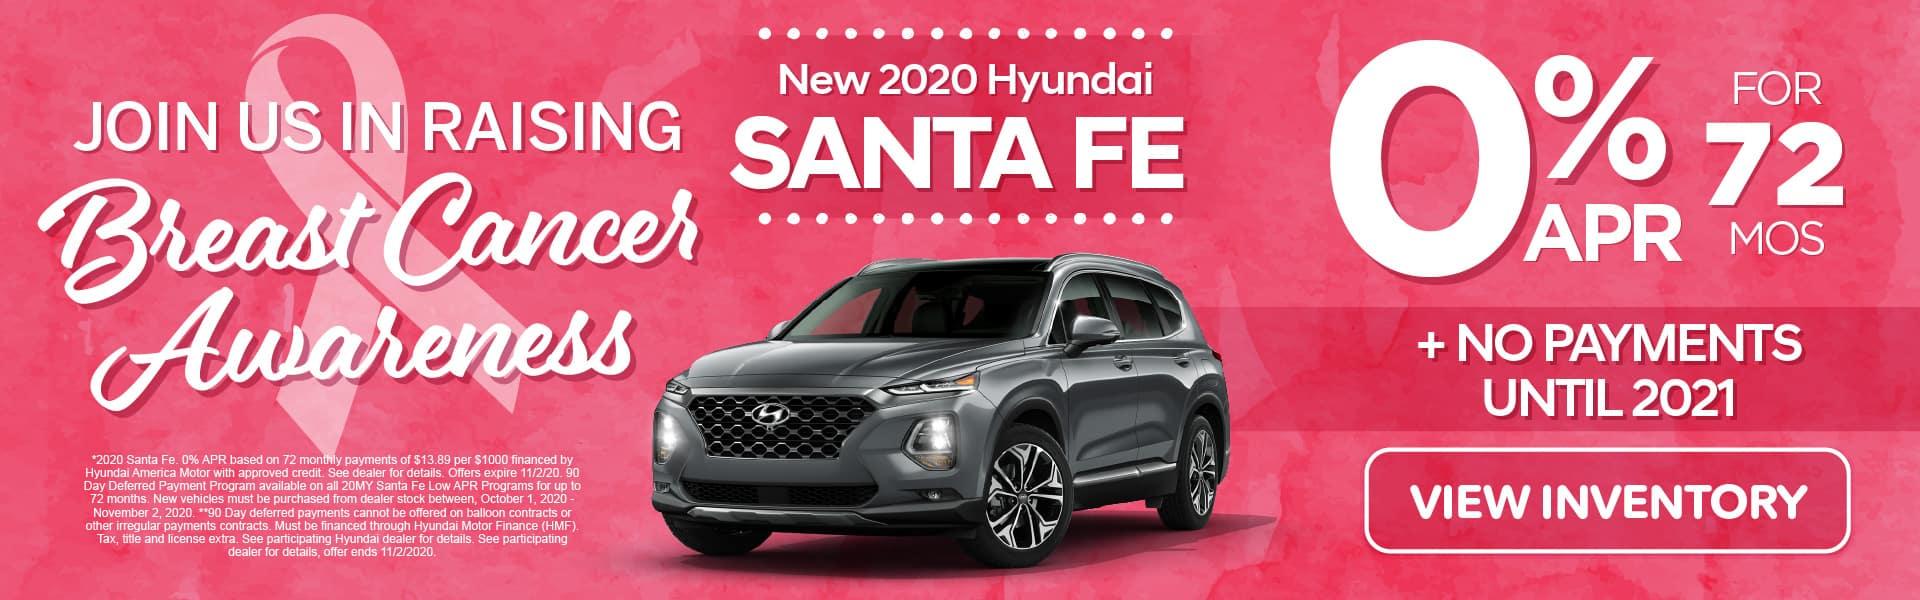 2020 Santa Fe 0% APR for 72 months